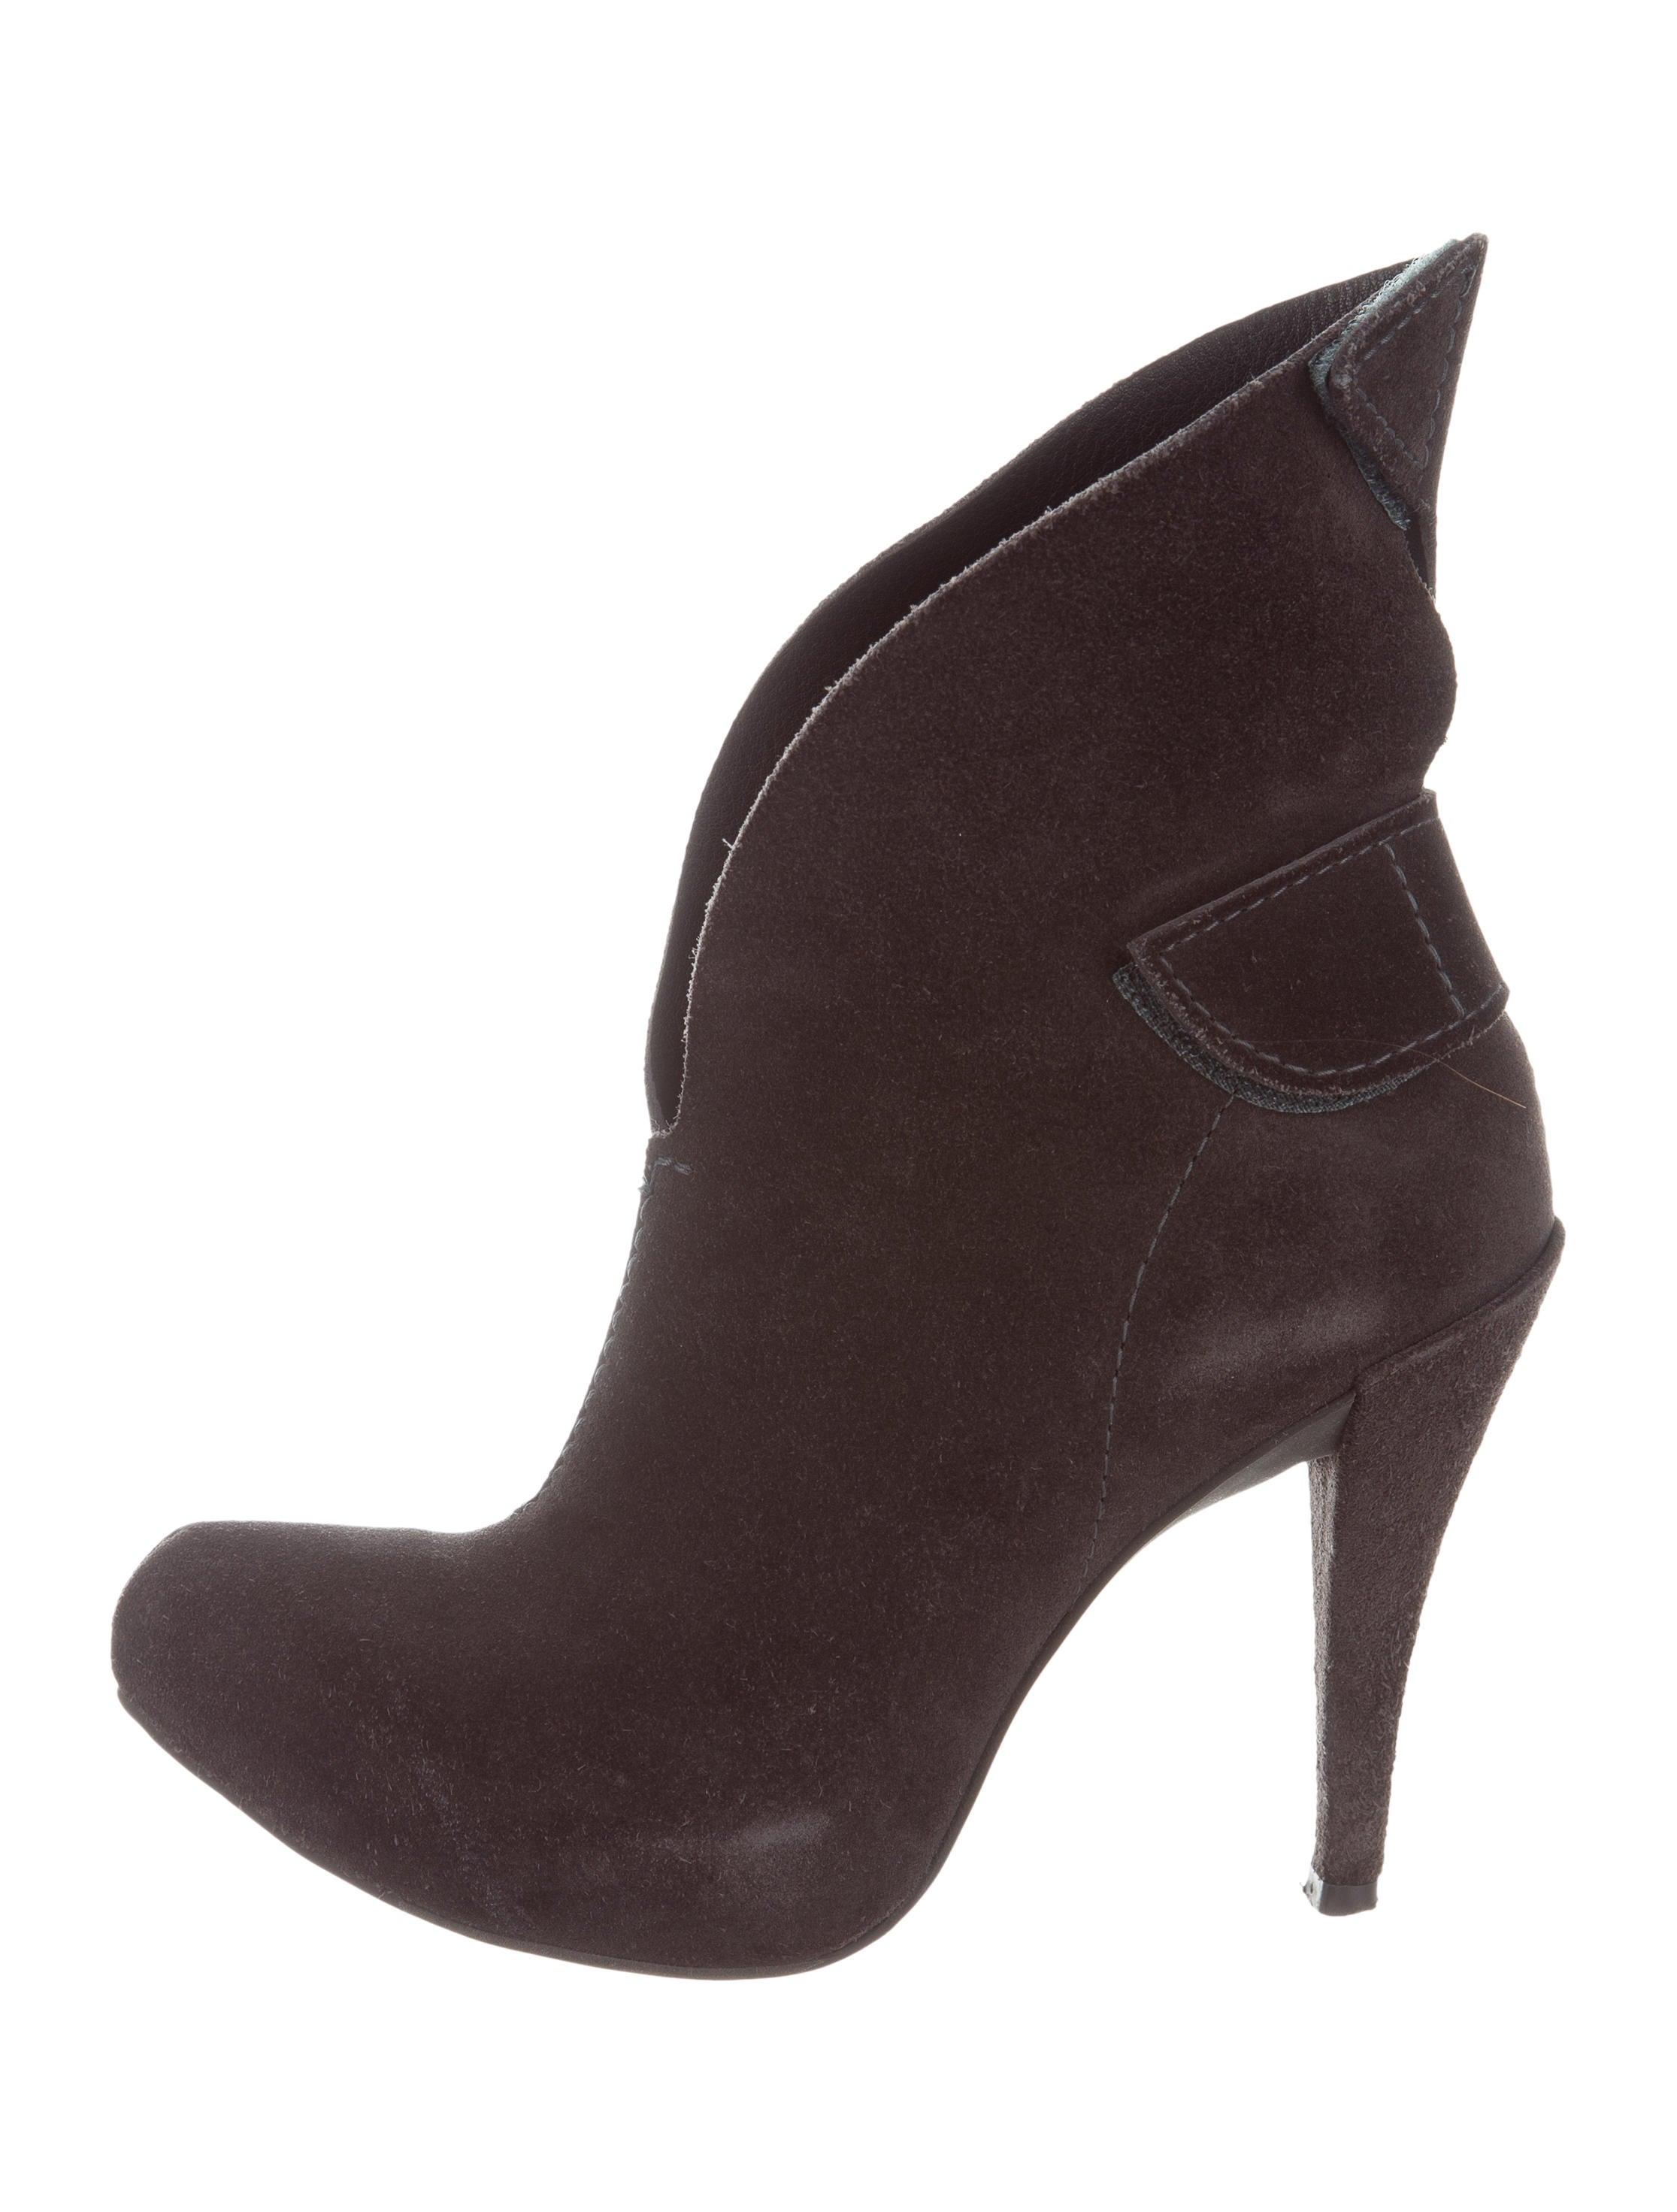 pedro garcia suede platform ankle boots shoes ped24886